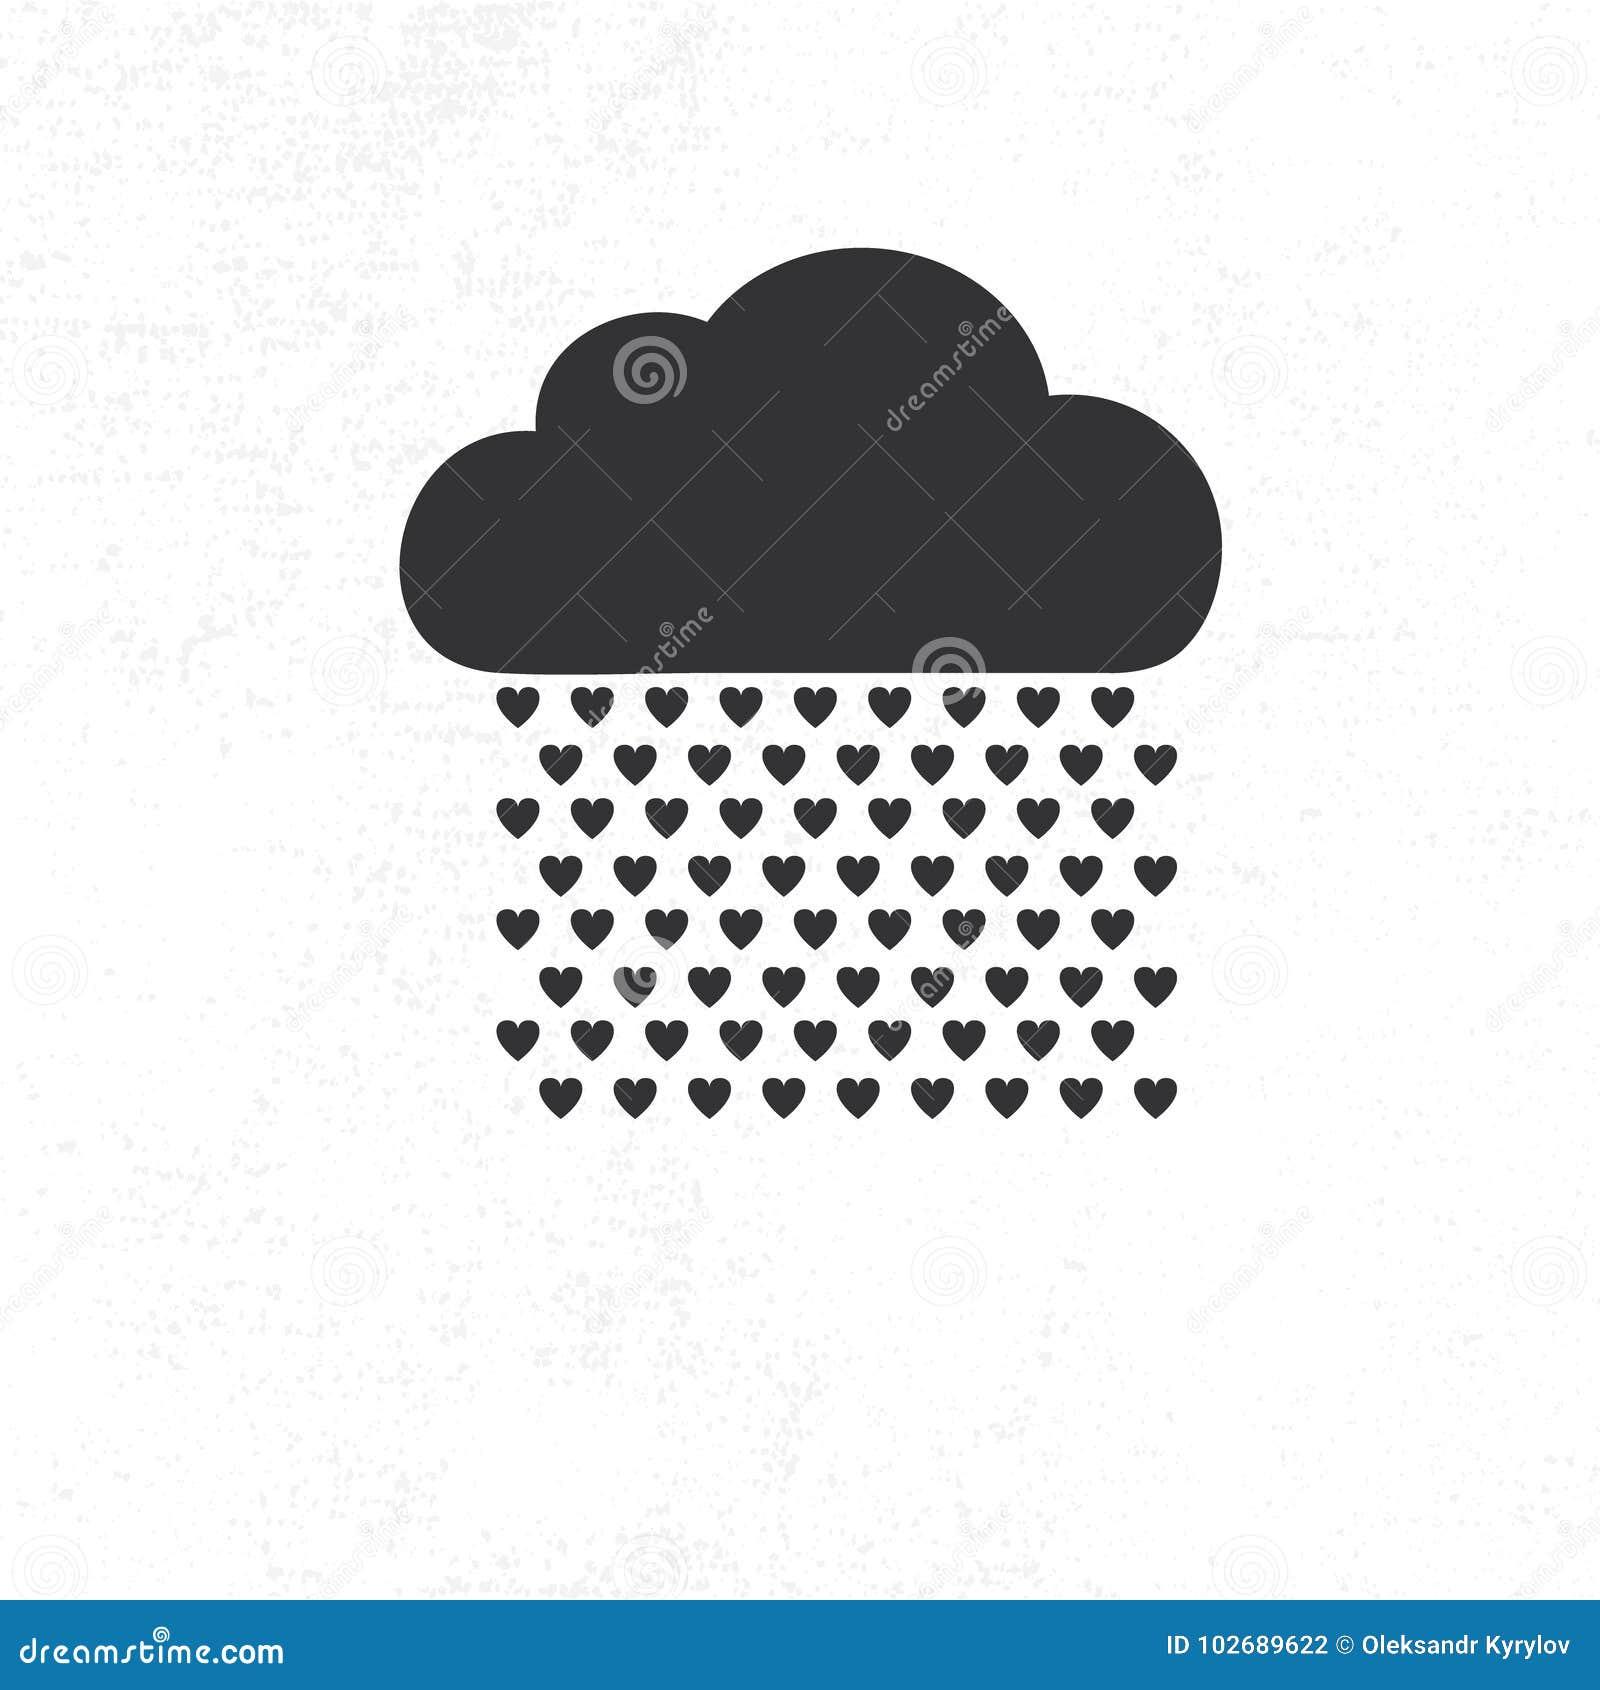 Chmura z serce deszczu kroplami